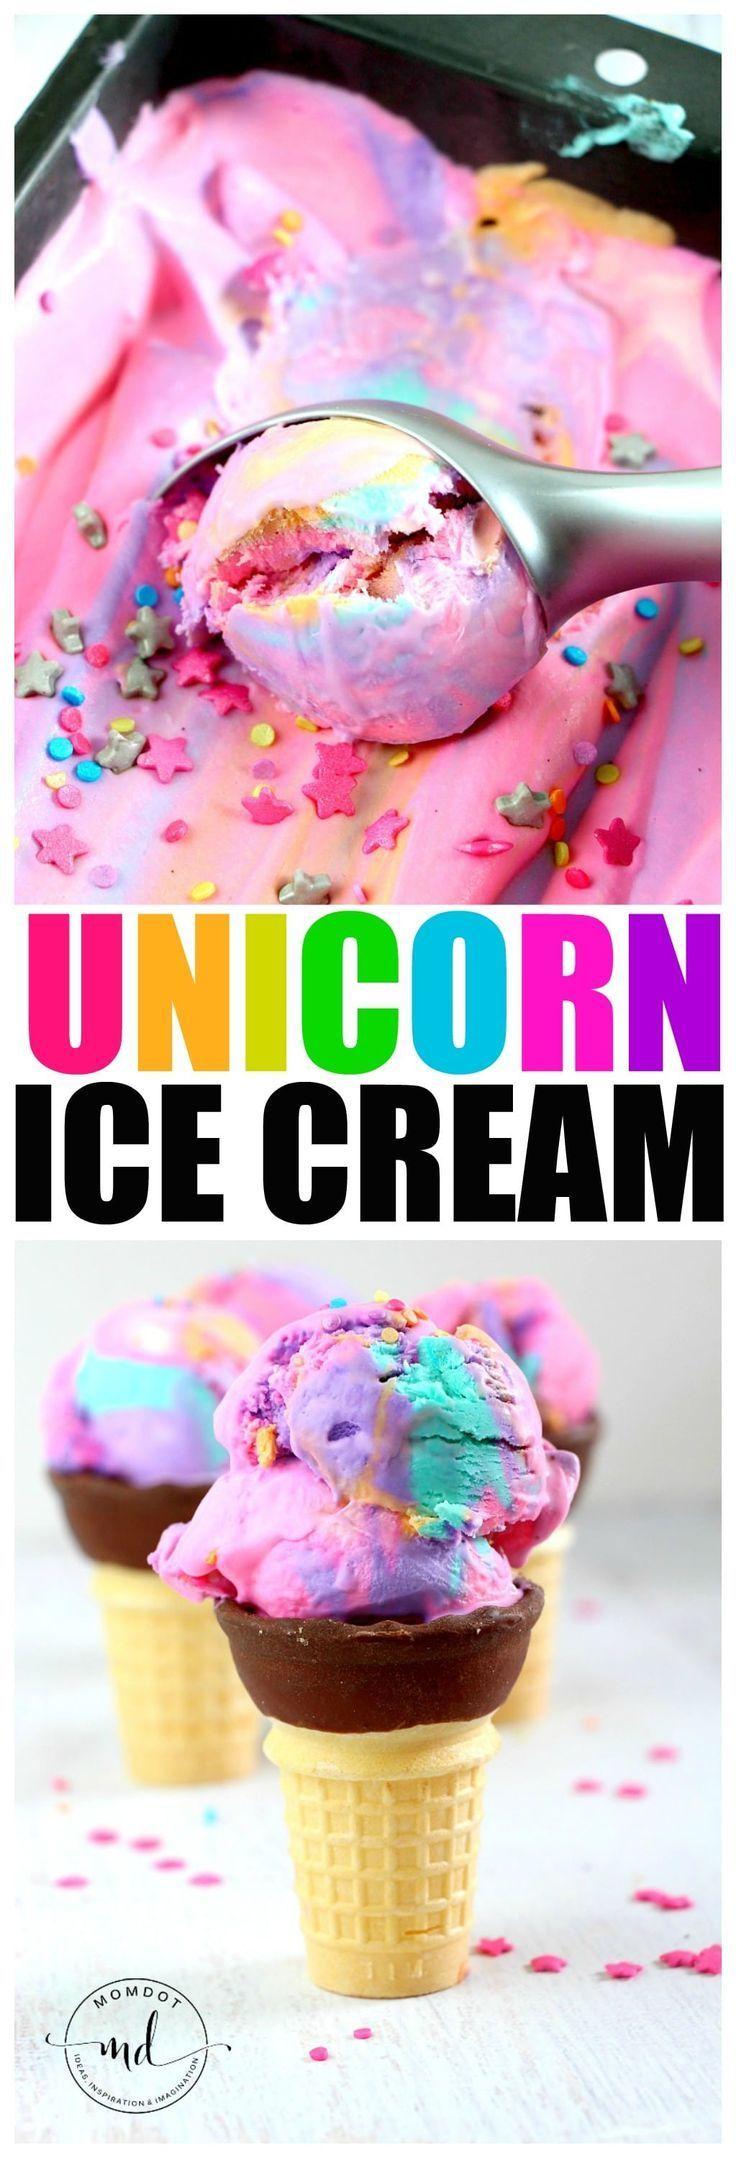 Unicorn Ice Cream Recipe: No Churn Rainbow ice cream - be ready today!  Be featured in Model Citizen App, Magazine and Blog.  www.modelcitizenapp.com